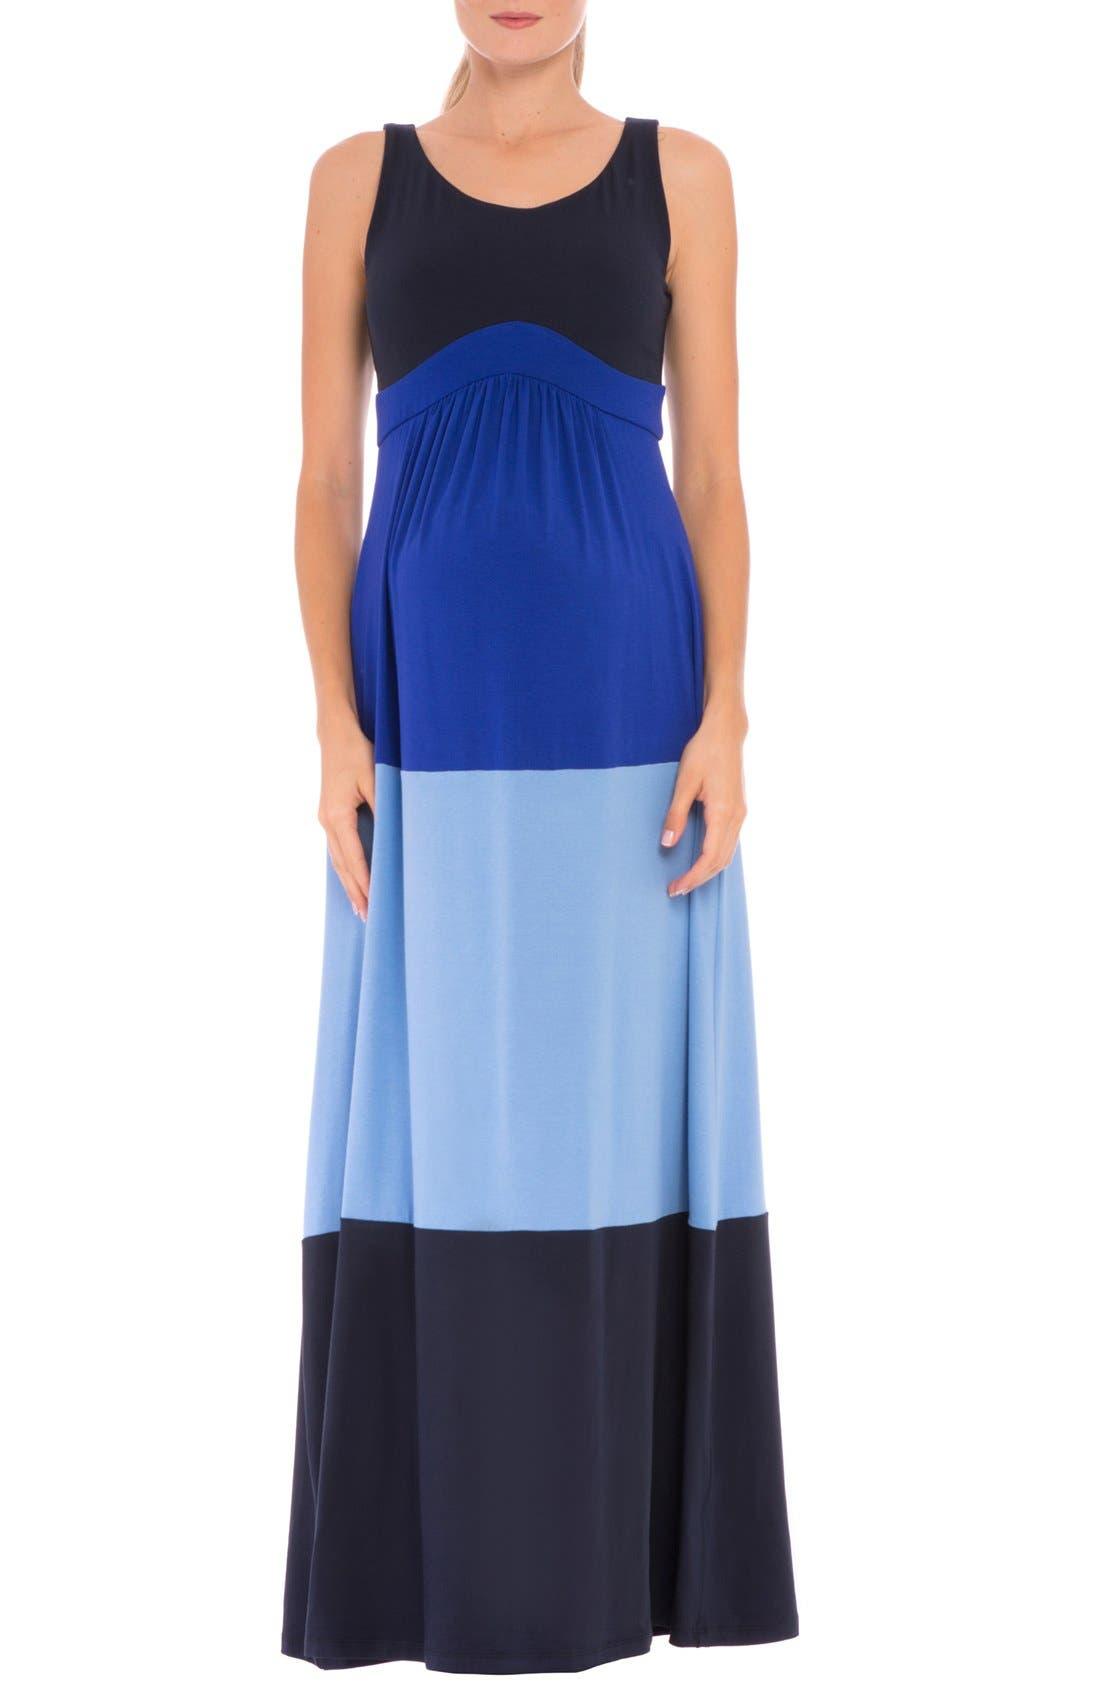 Main Image - Olian 'Margarette' Colorblock Maternity Tank Dress